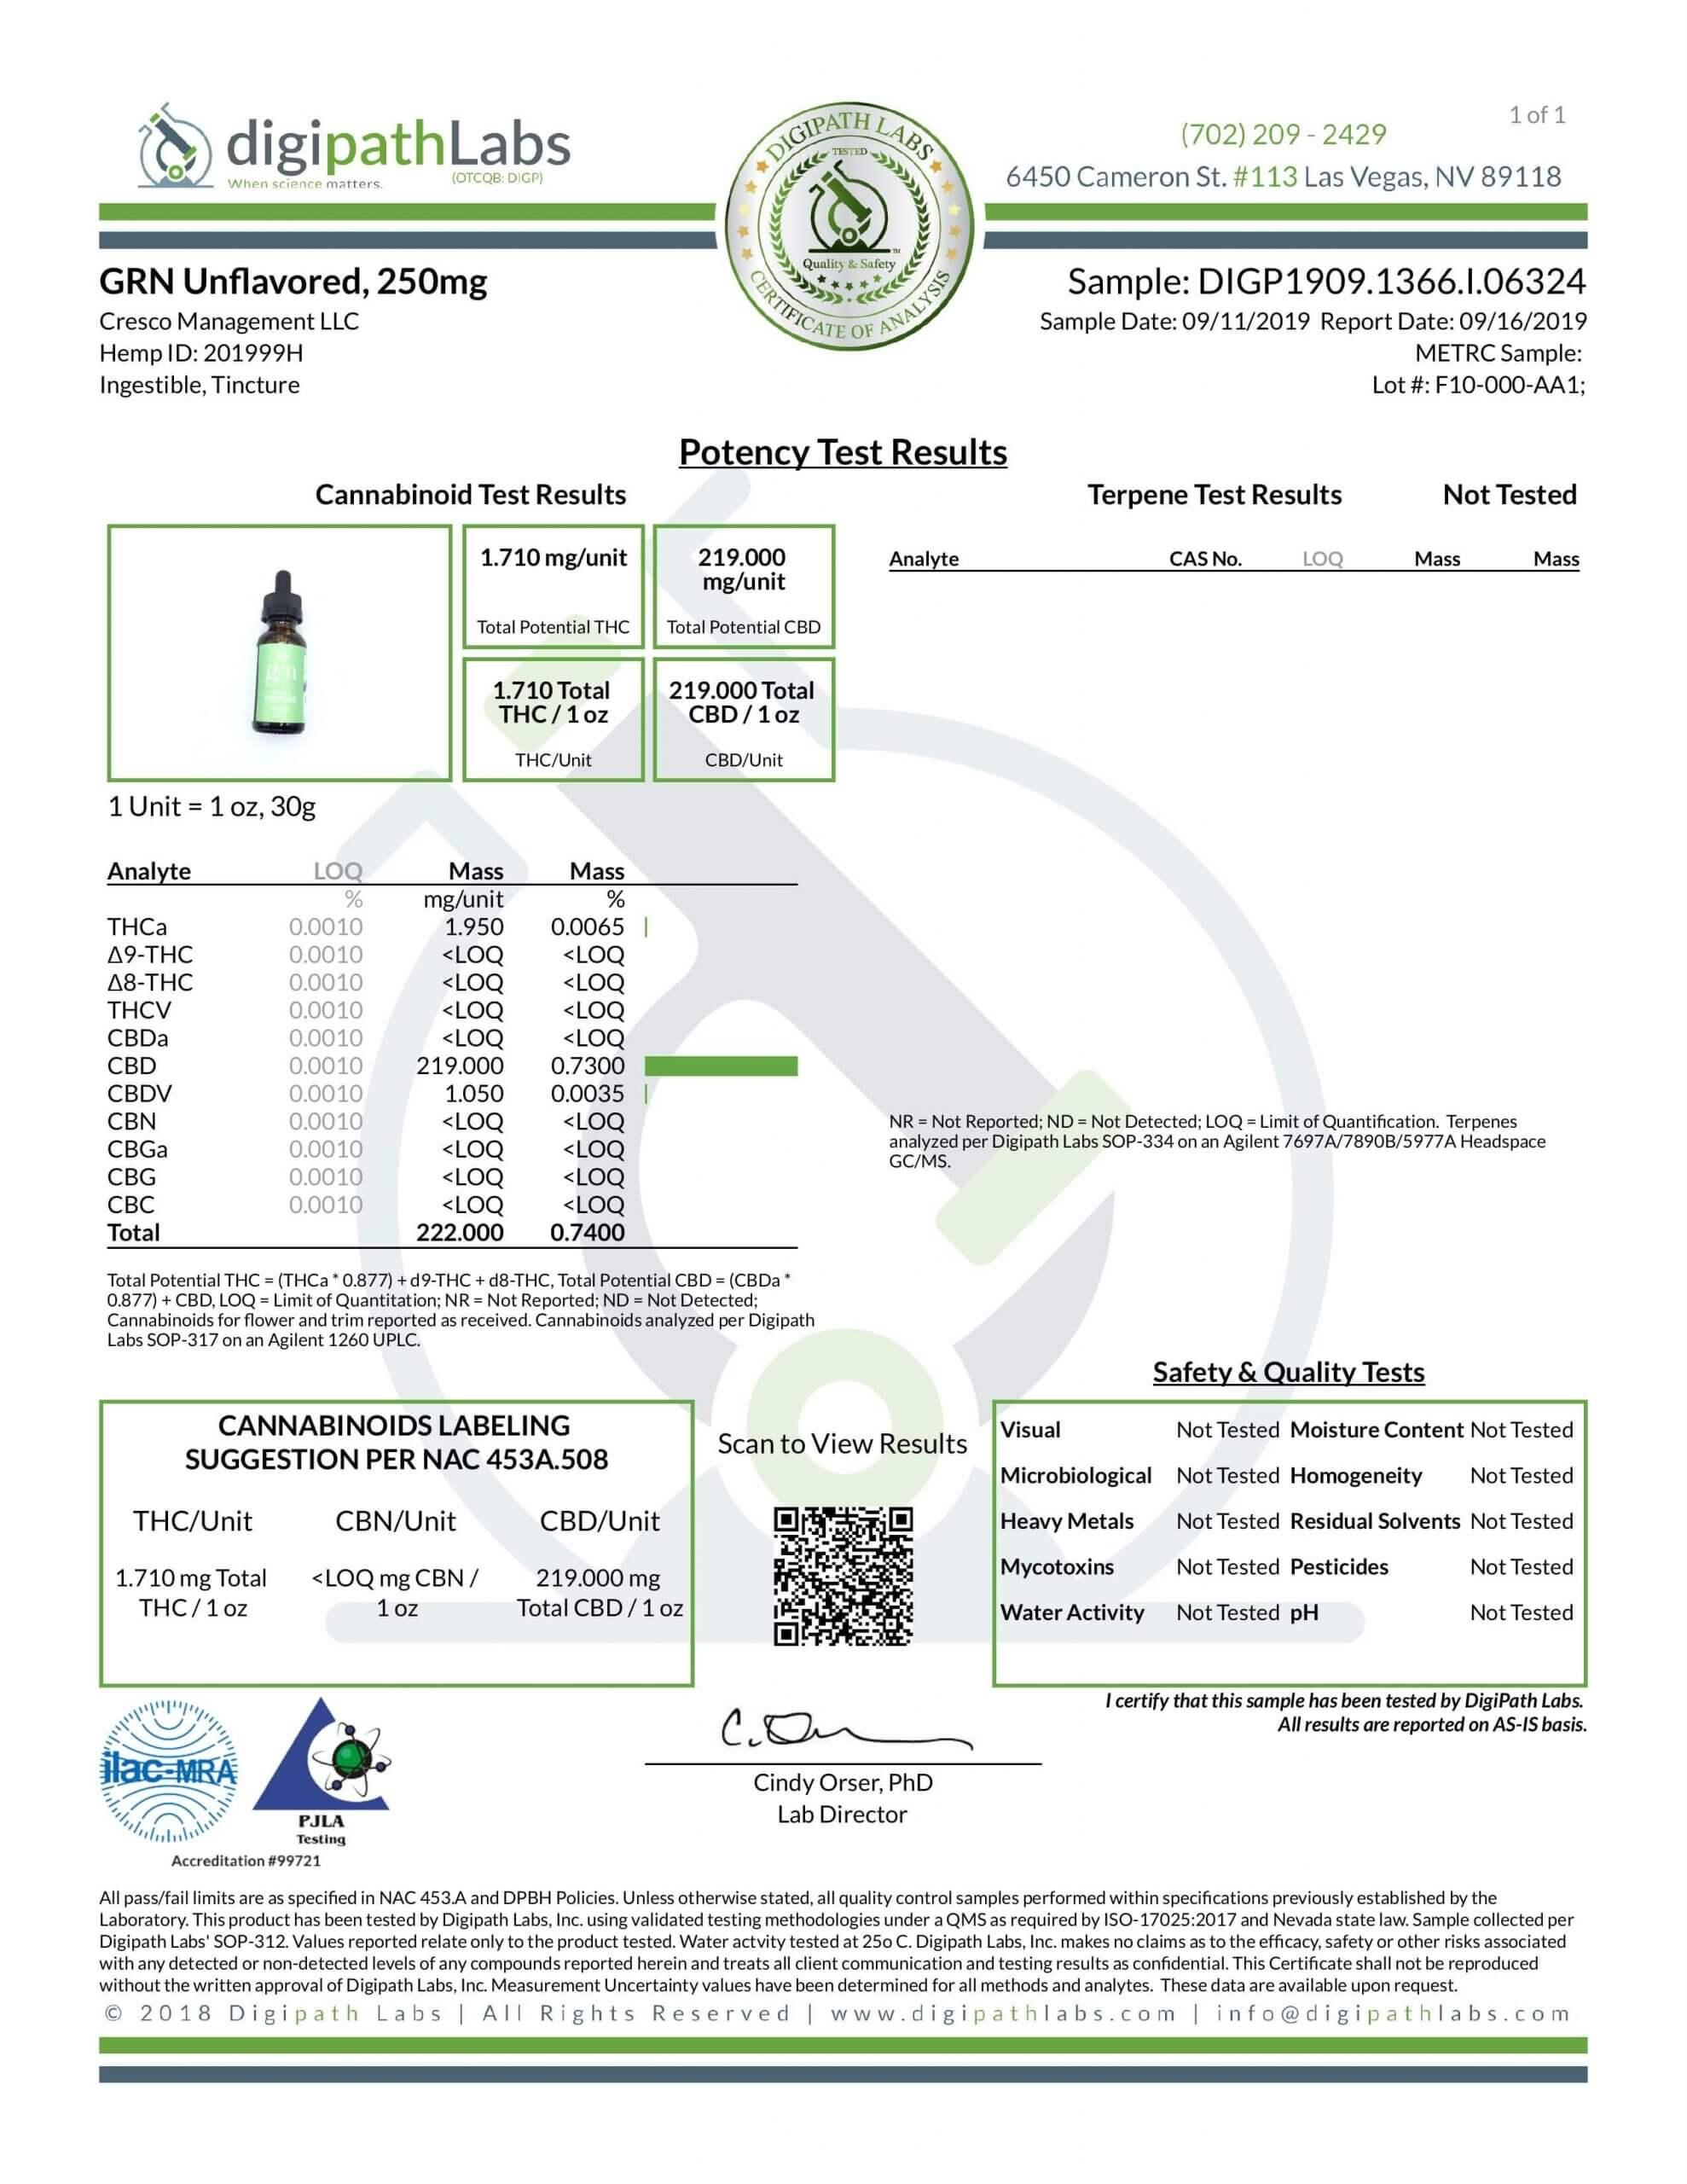 GRN CBD Oil Tincture Unflavored Lab Report Broad Spectrum 250mg